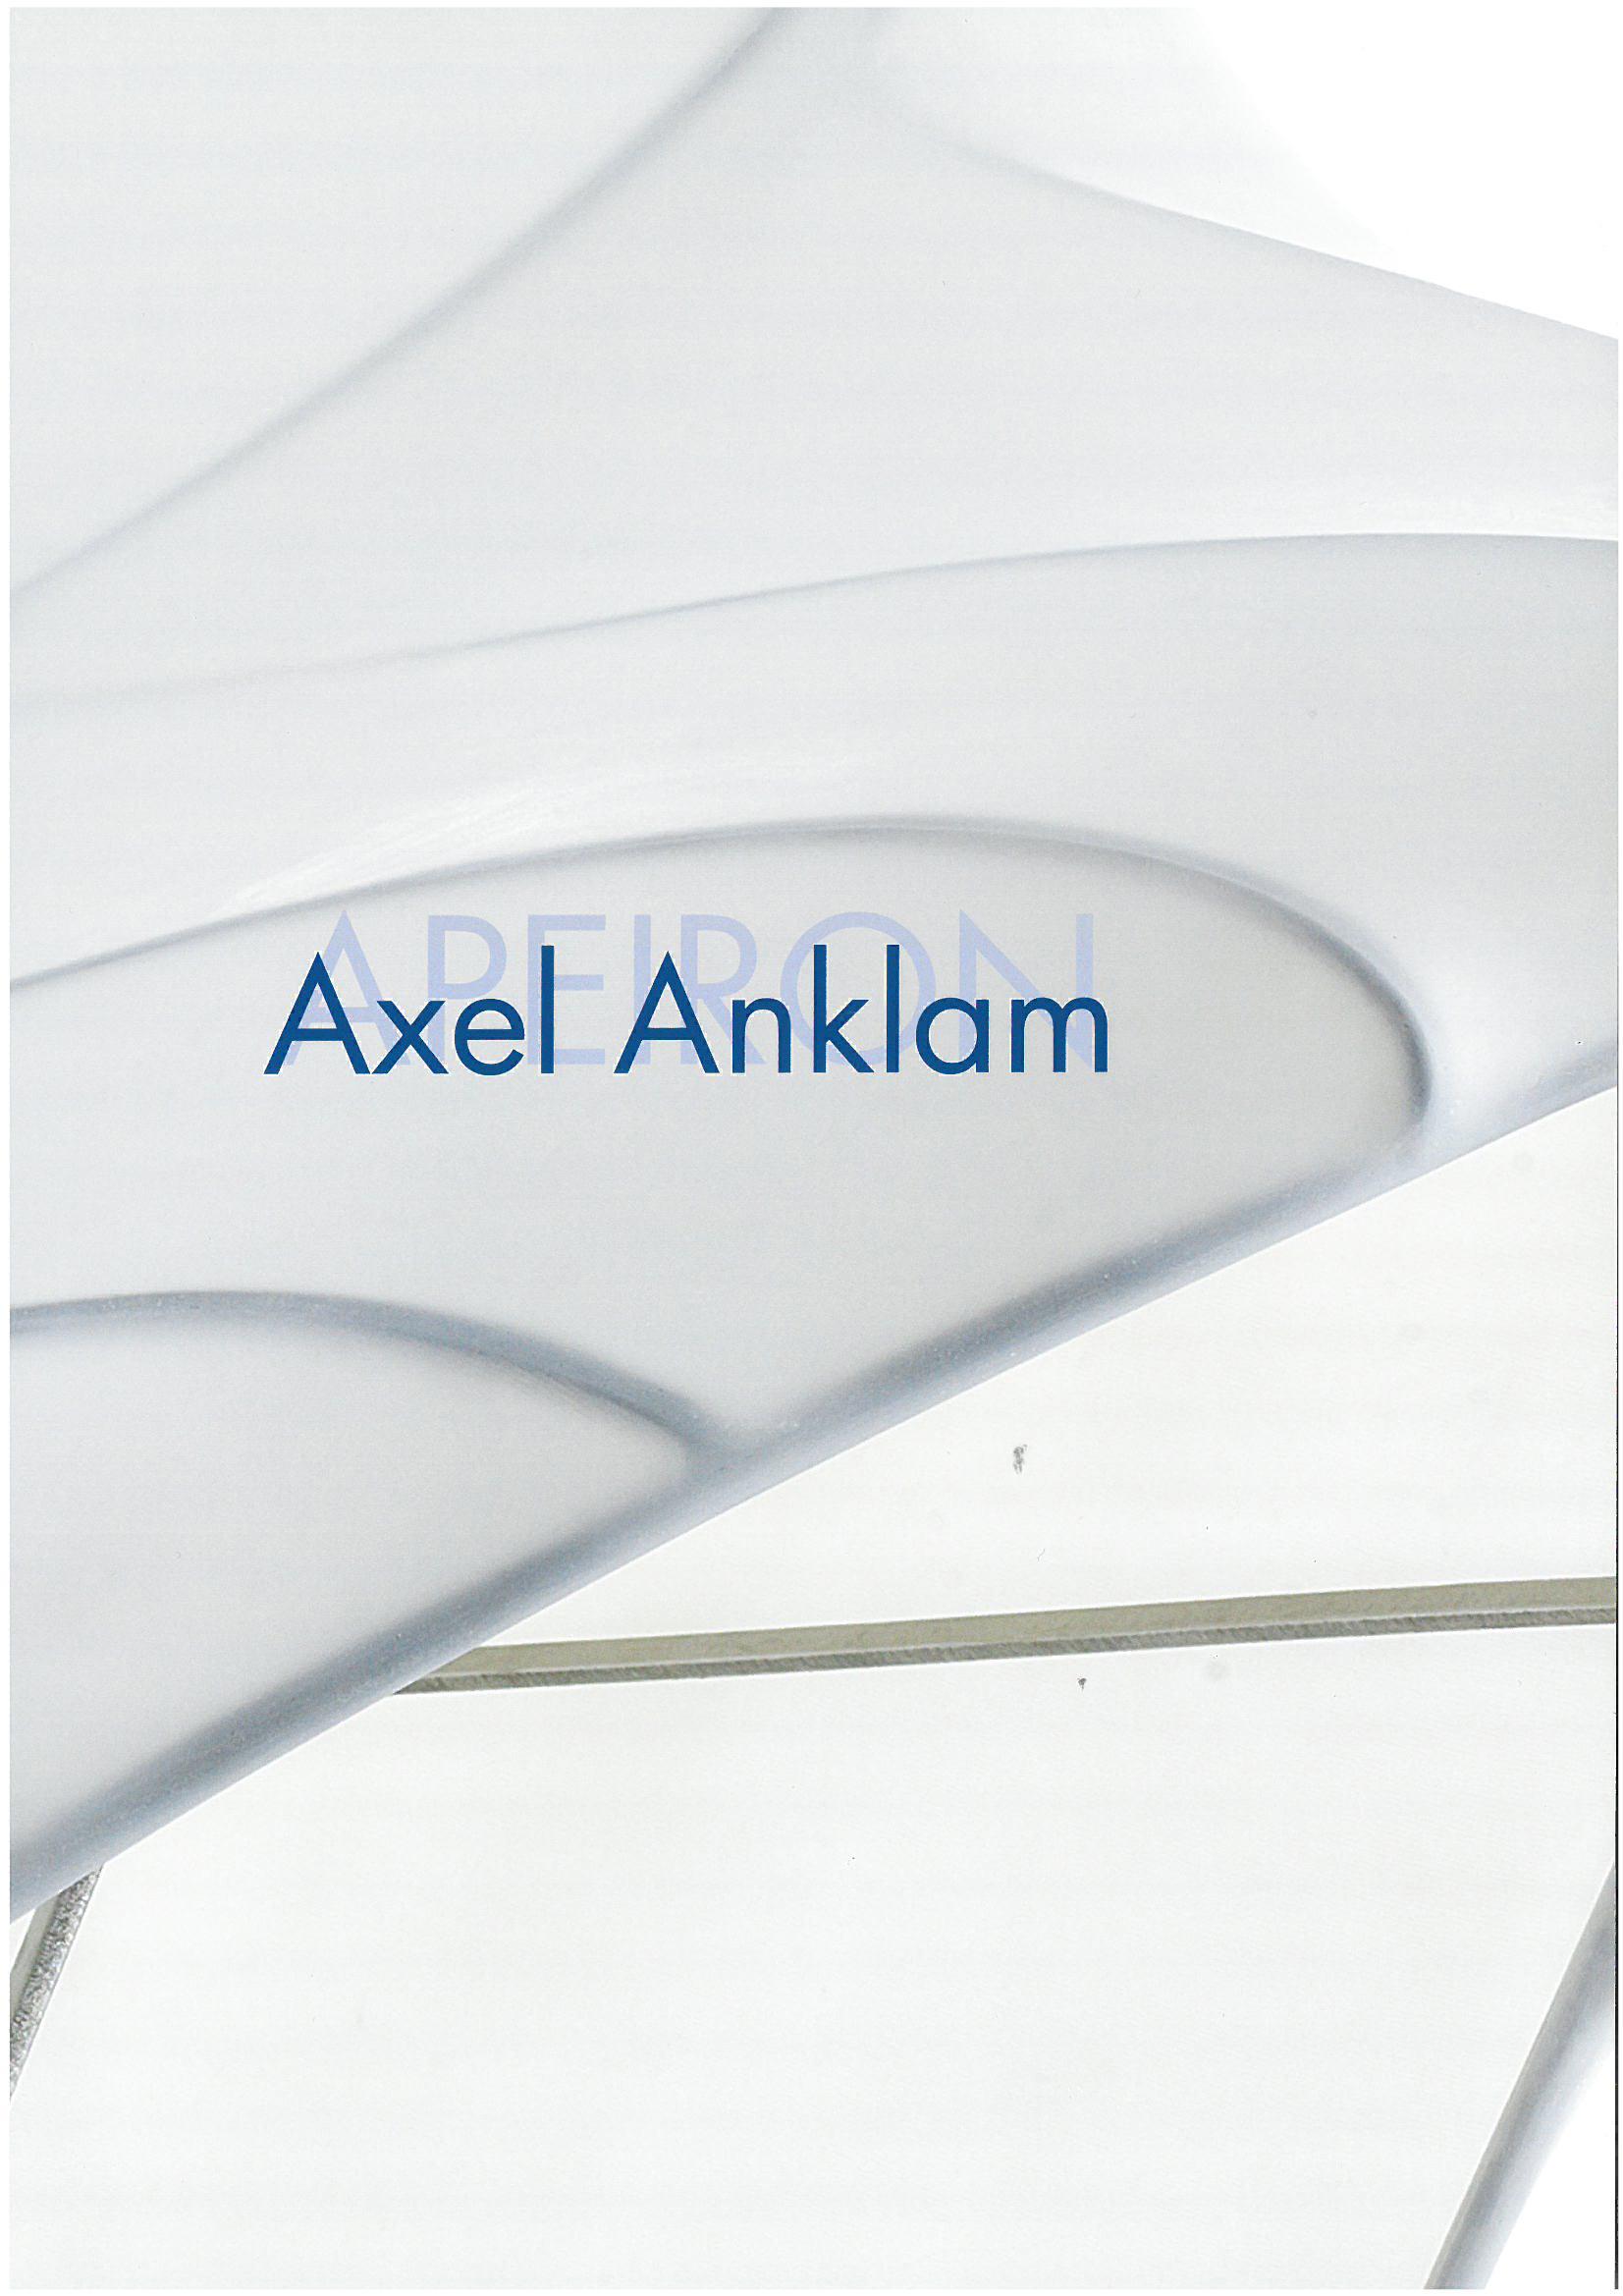 AXEL ANKLAM